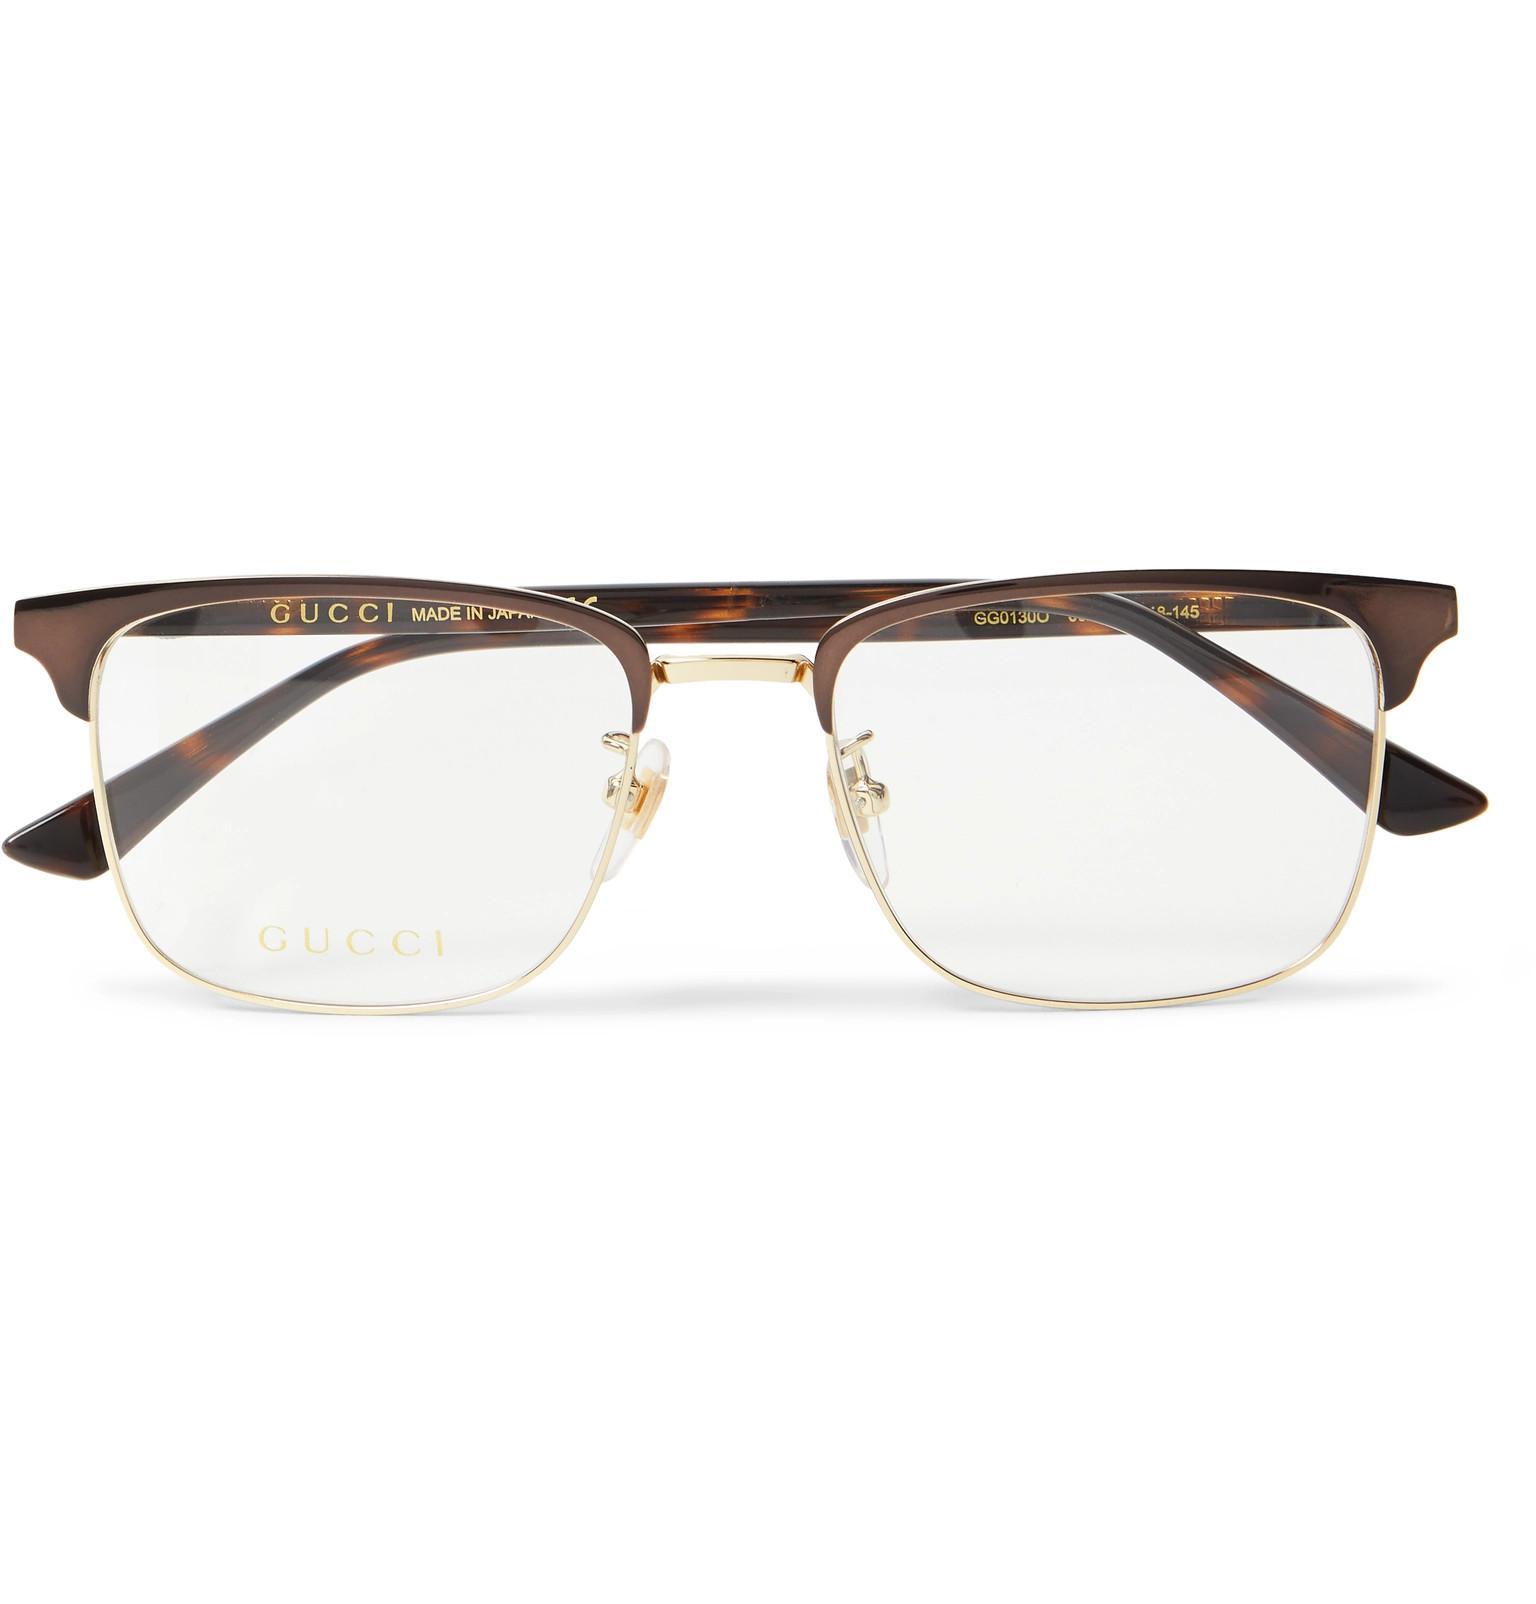 1326712f0a527 Gucci Square-frame Tortoiseshell Acetate And Gold-tone Optical ...